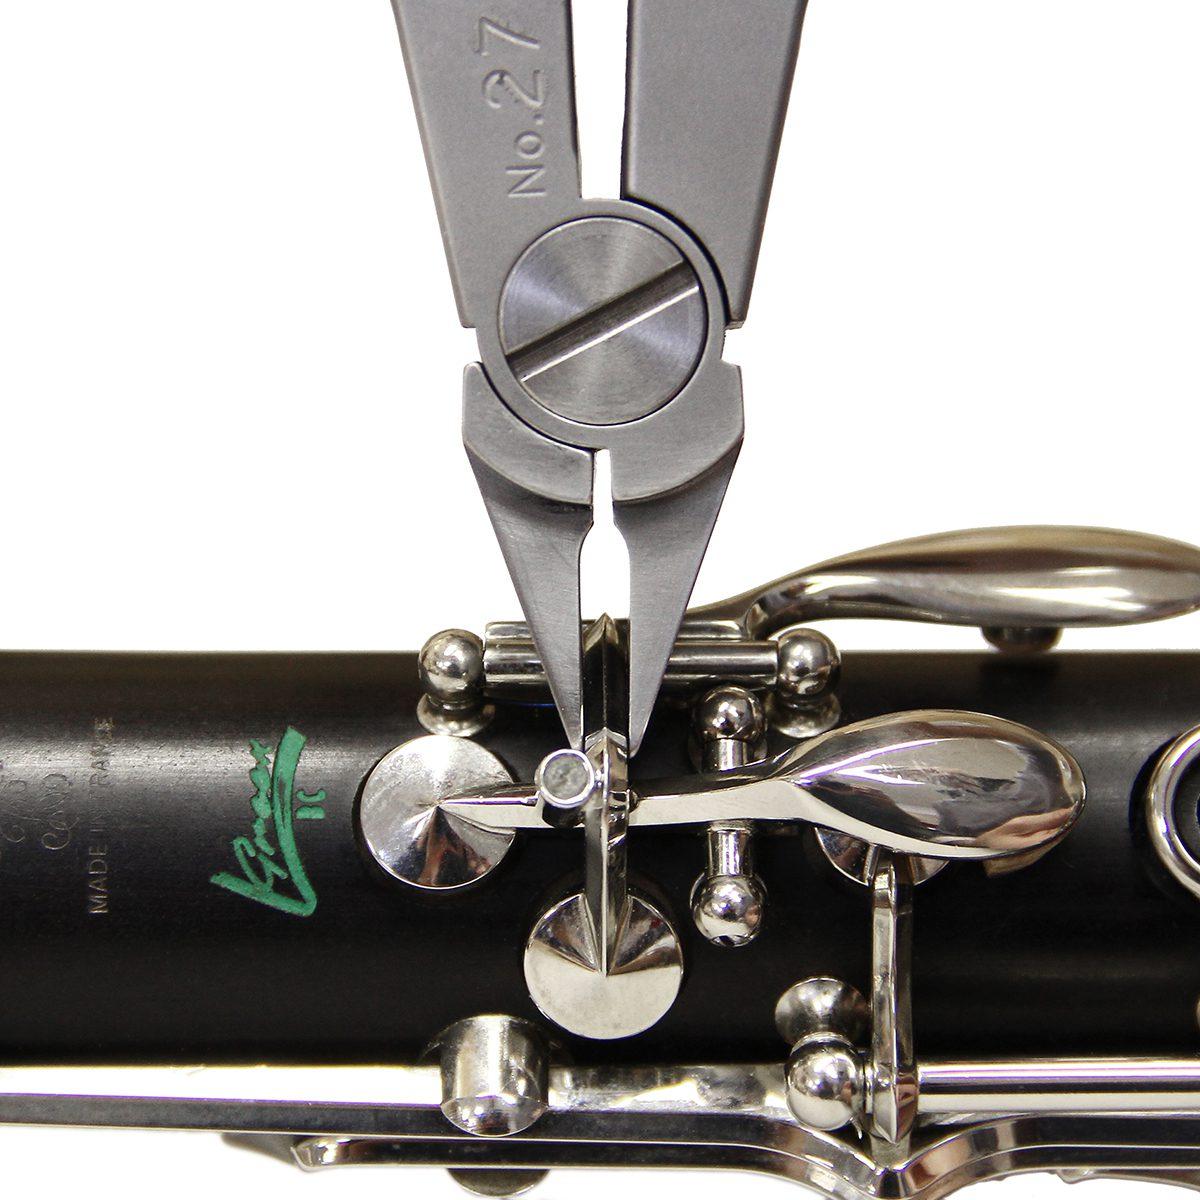 jls model 27 key arm and foot plier 4